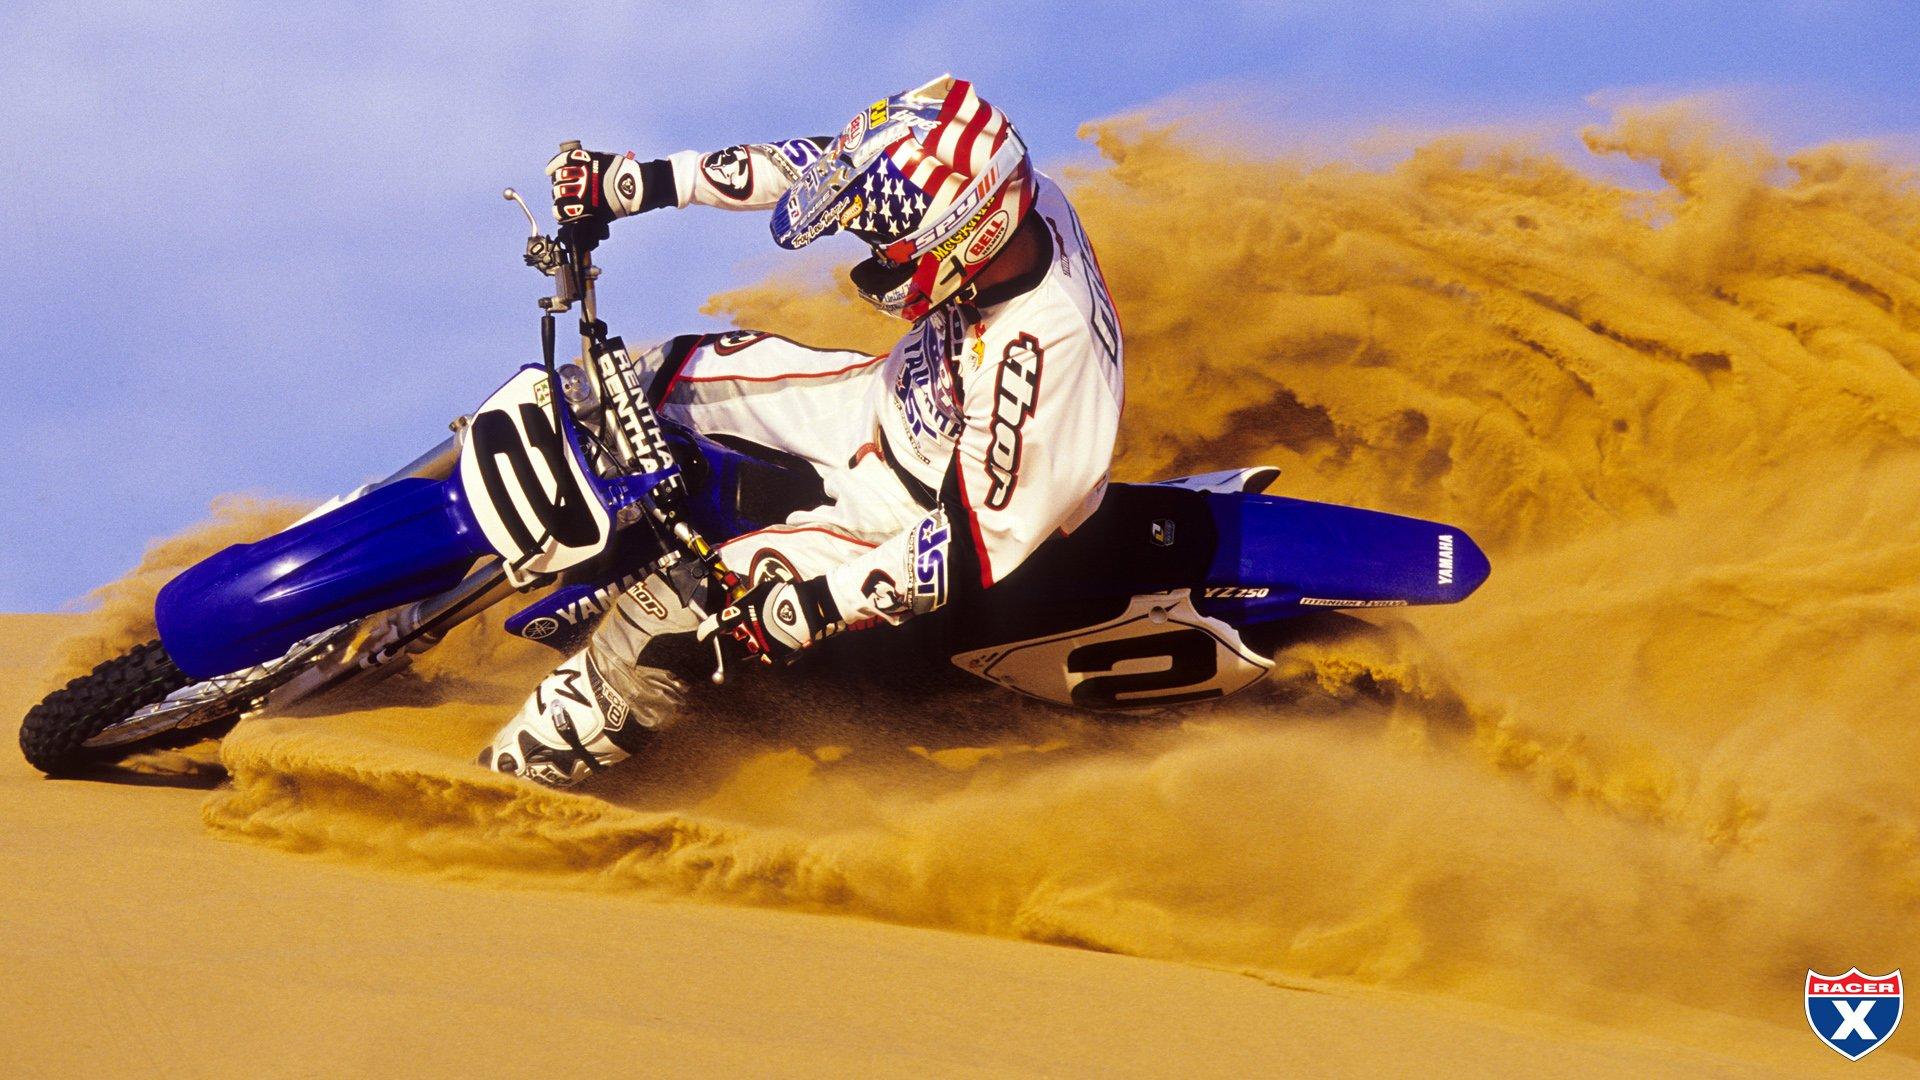 Honda Of Covington >> Jeremy McGrath Wallpapers - Racer X Online